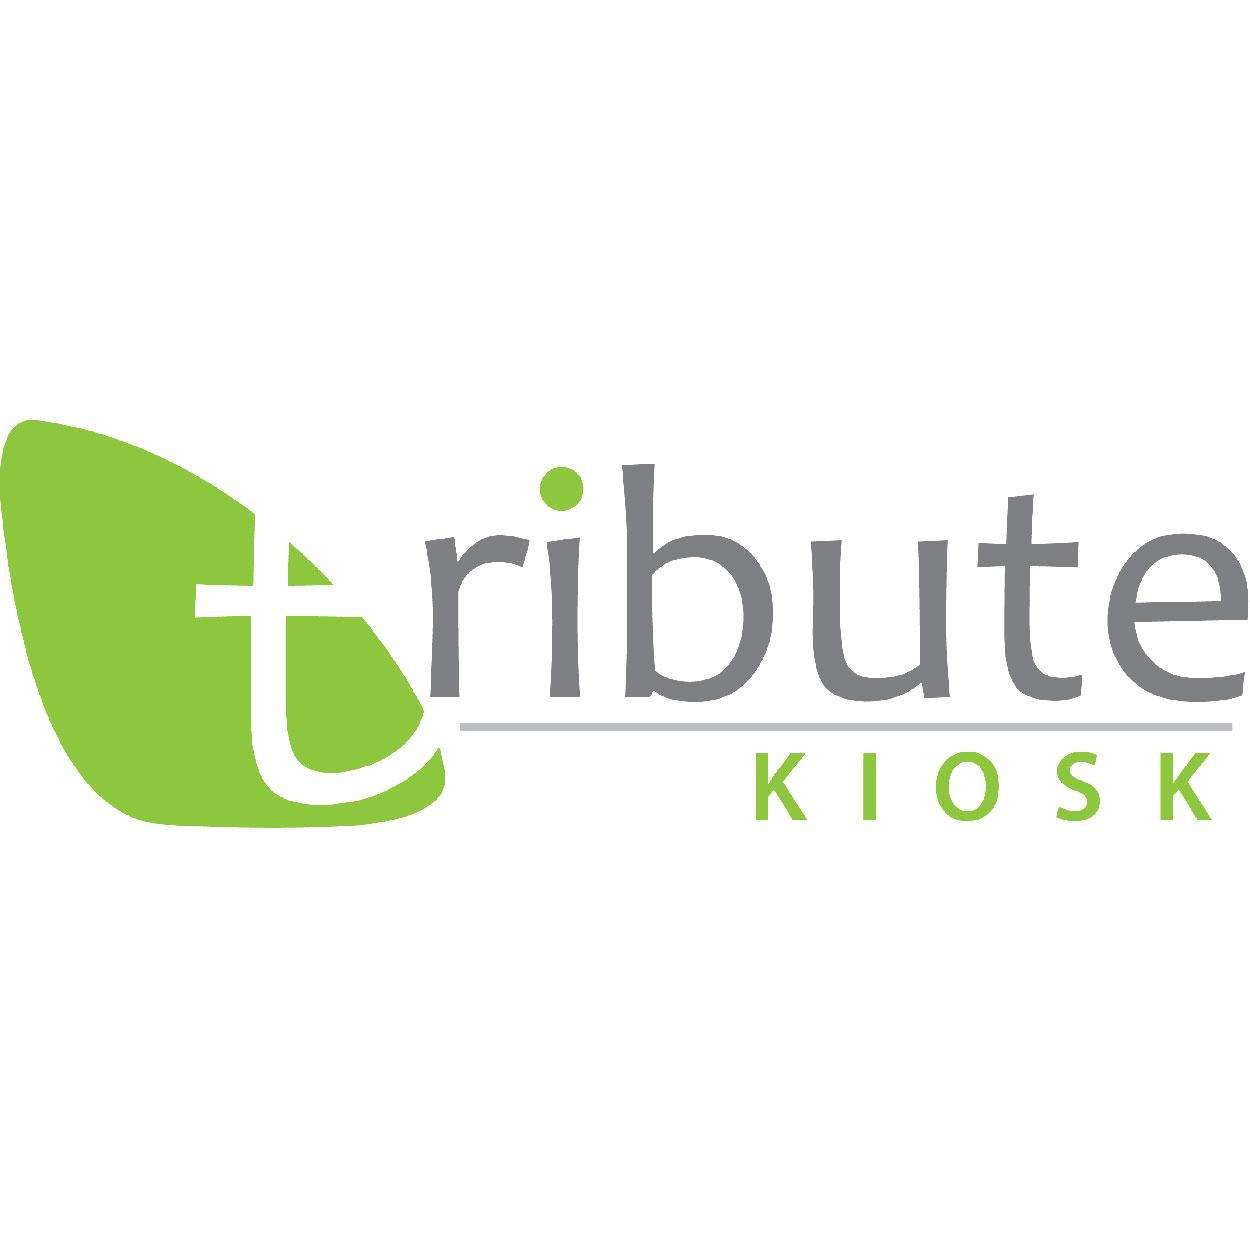 Tribute Kiosk Inc